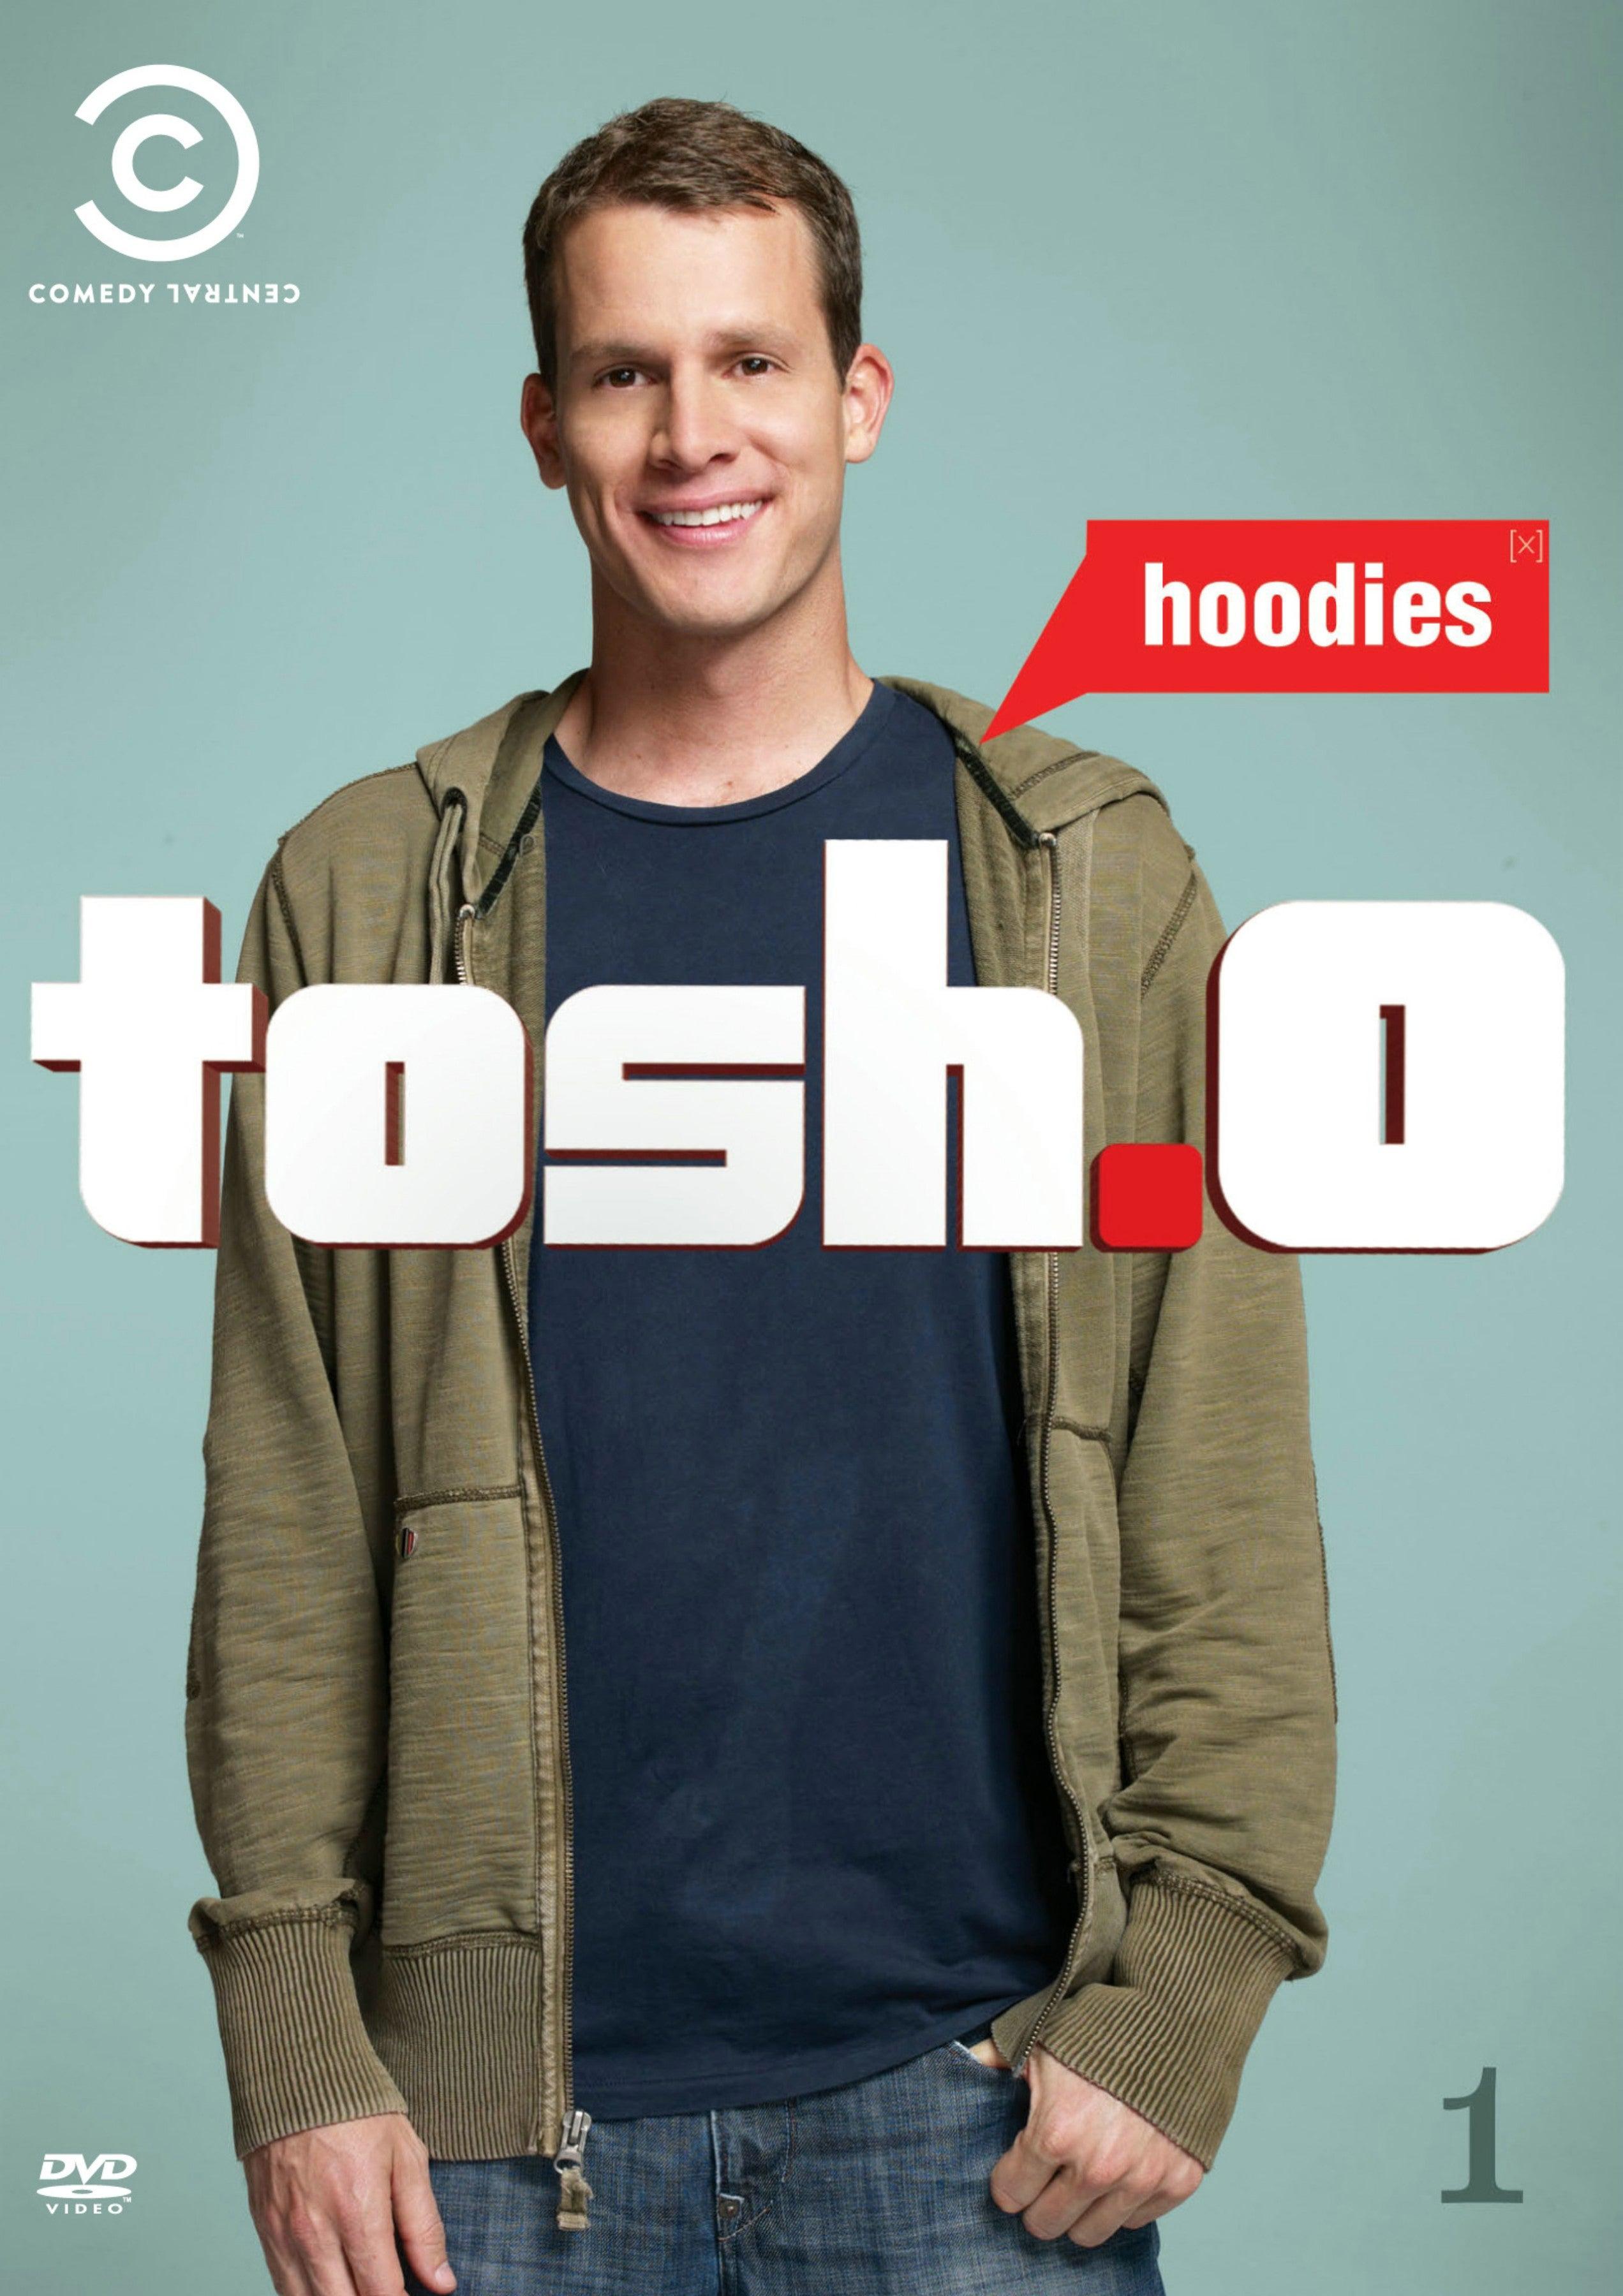 Tosh.0: Hoodies (DVD)